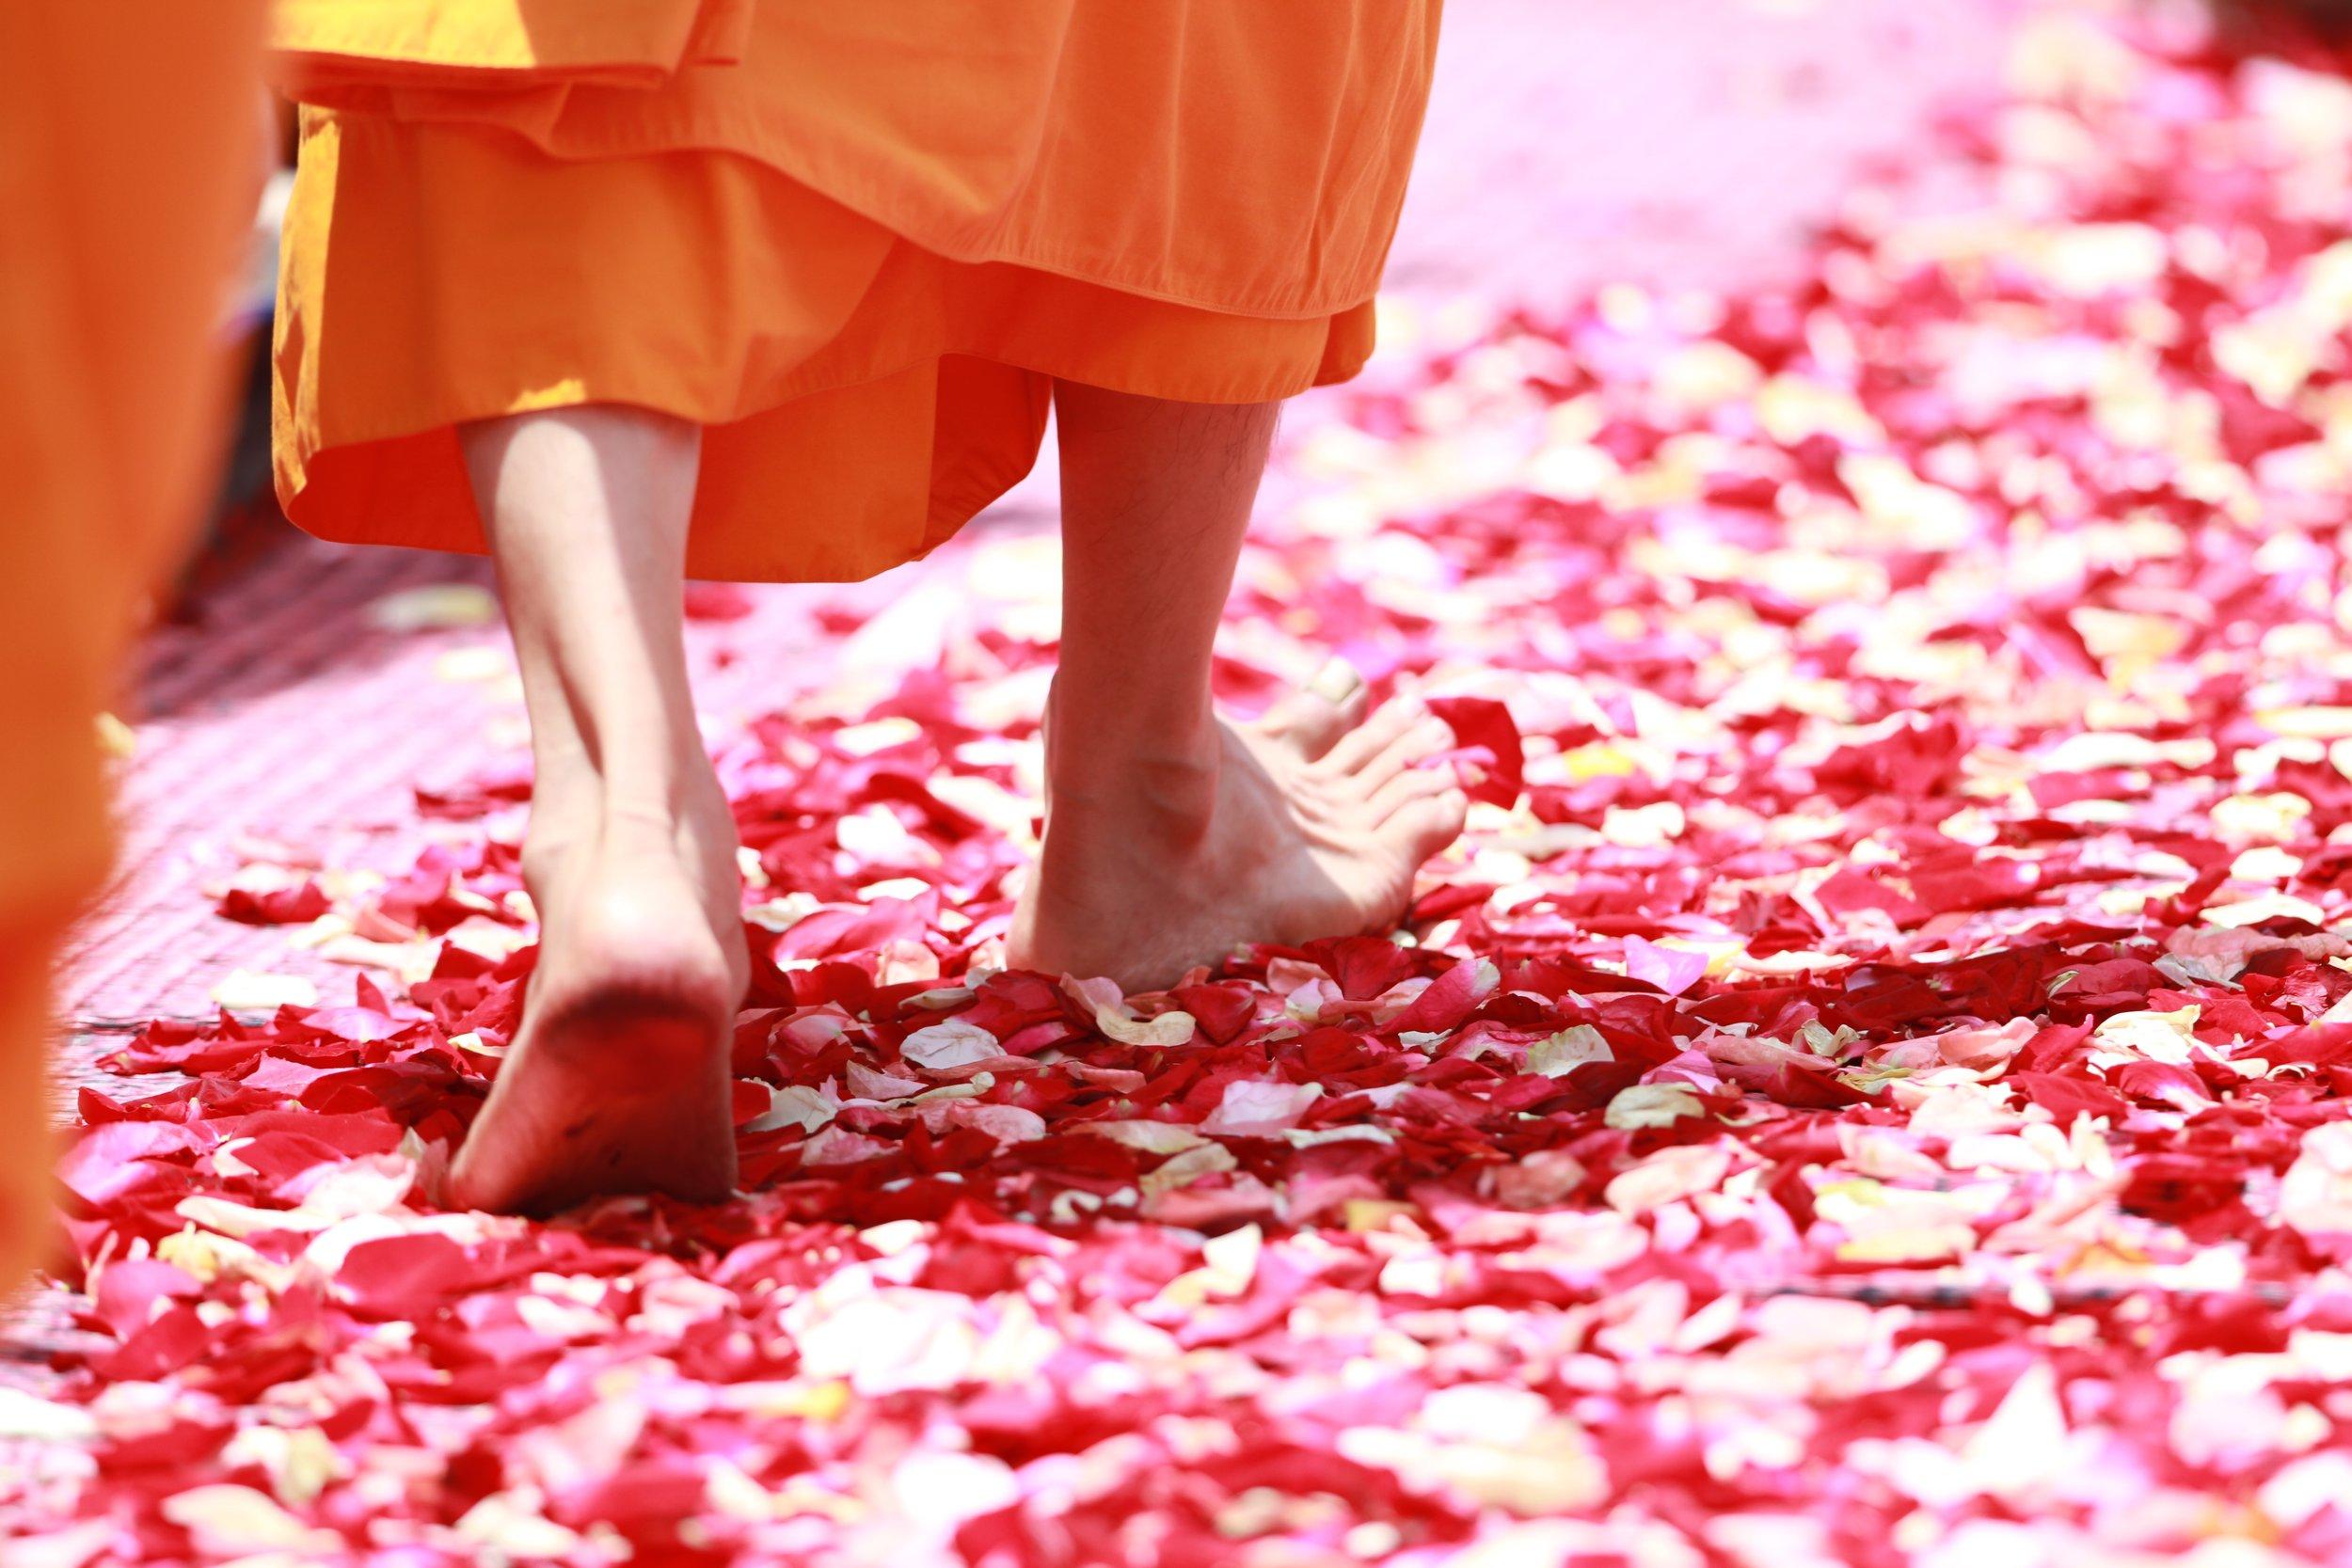 uwm.love.man-walking-people-play-flower-petal-1333633-pxhere.com